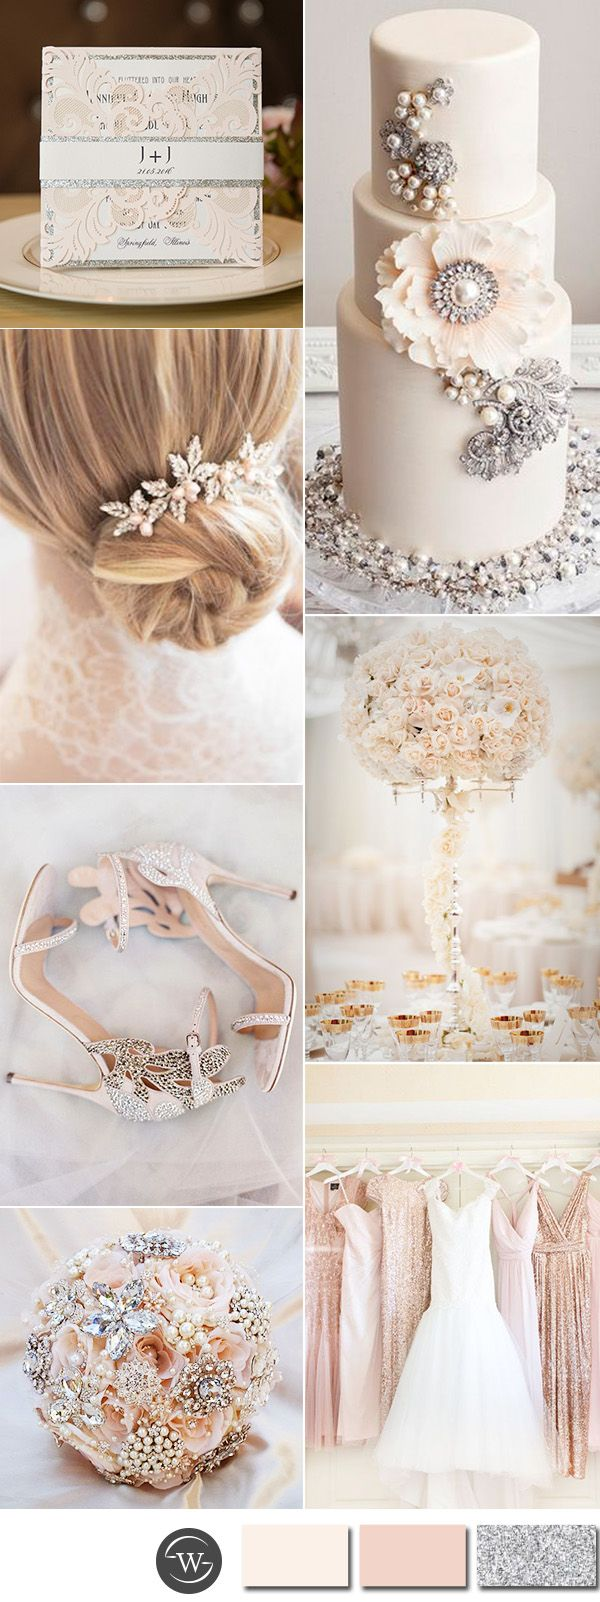 291 best Wedding Inspirations images on Pinterest | Wedding ideas ...